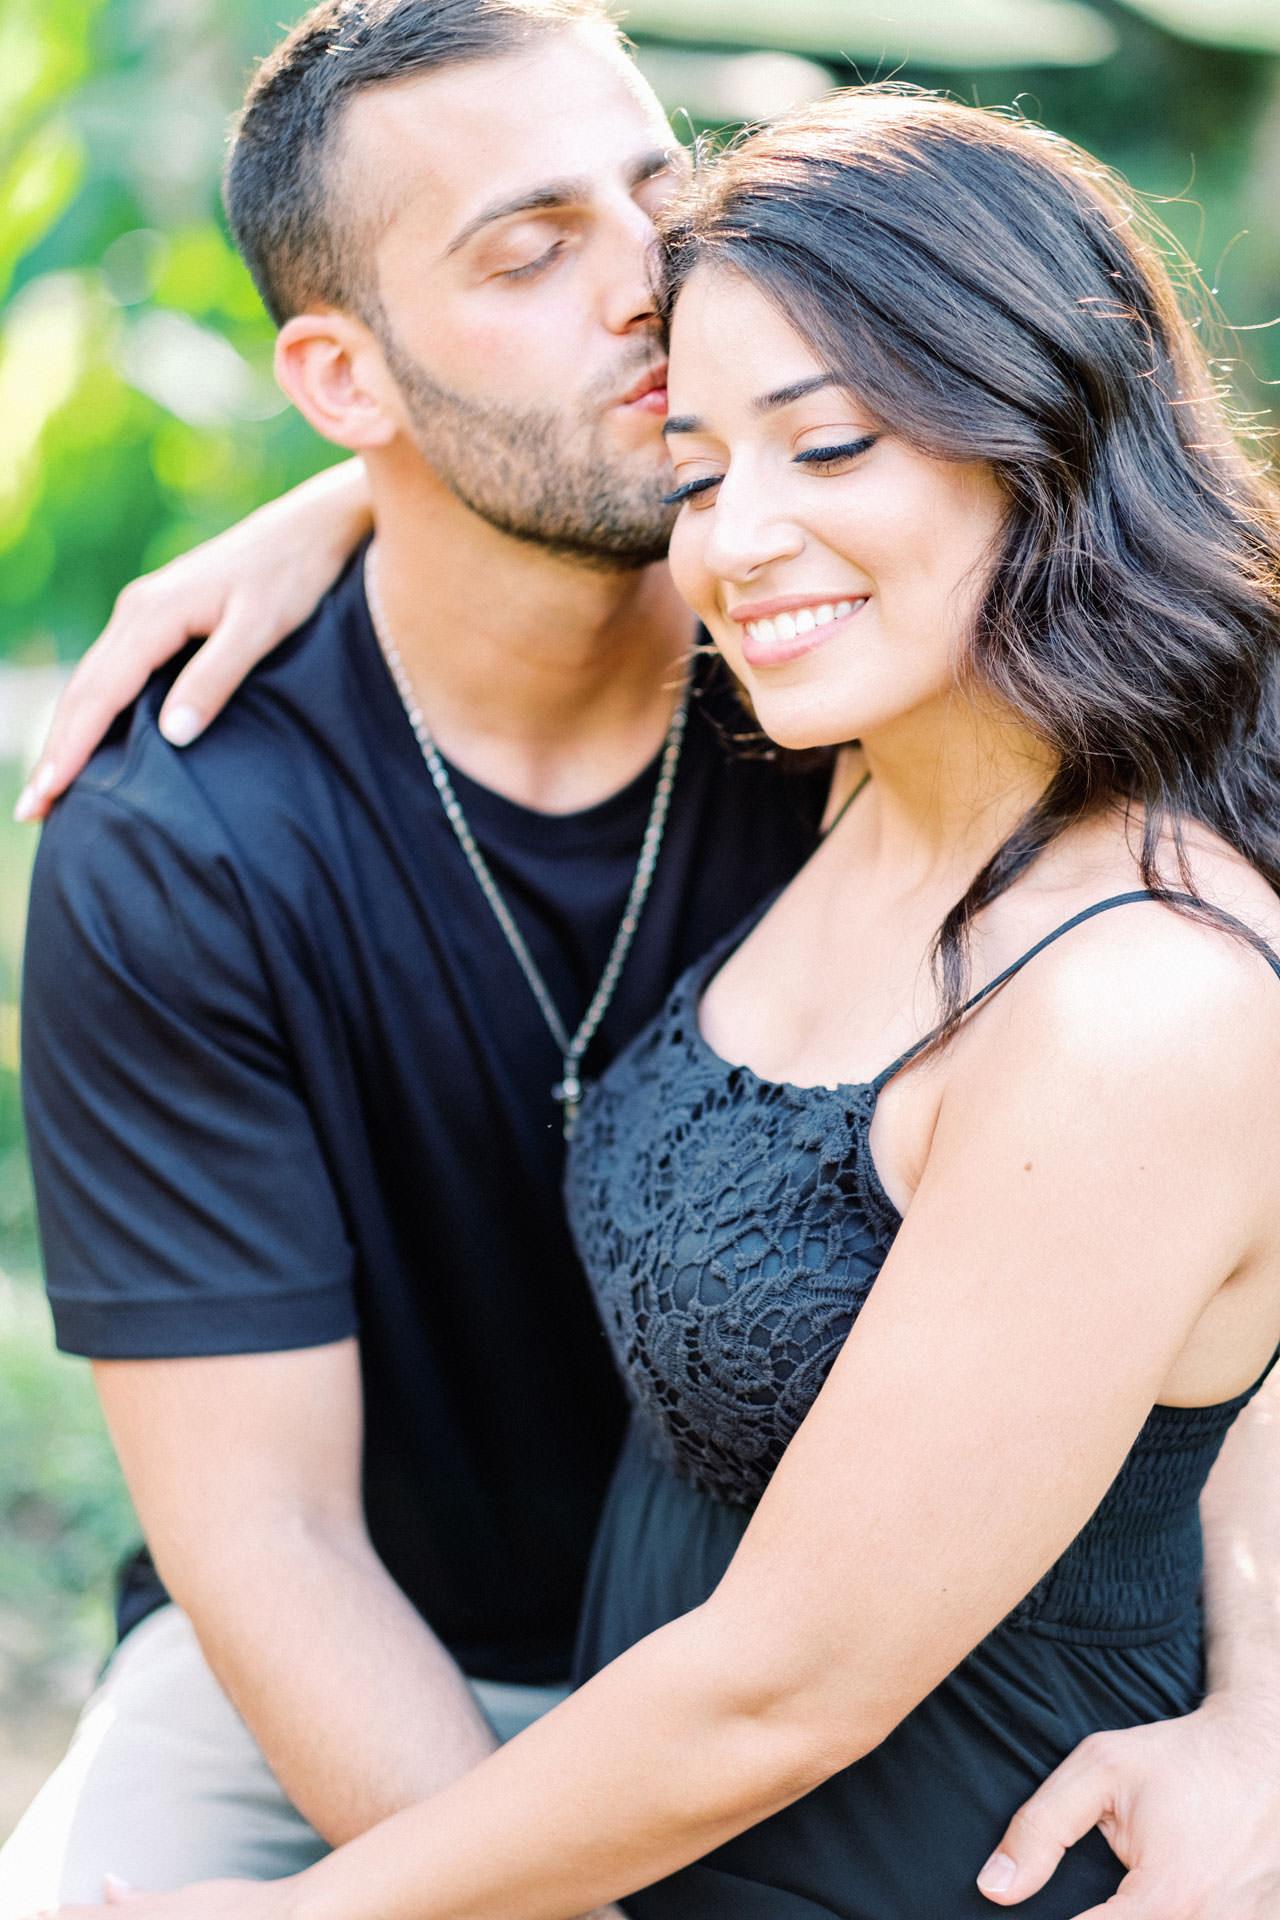 Honeymoon Photo Session at The World's Best Resort 10